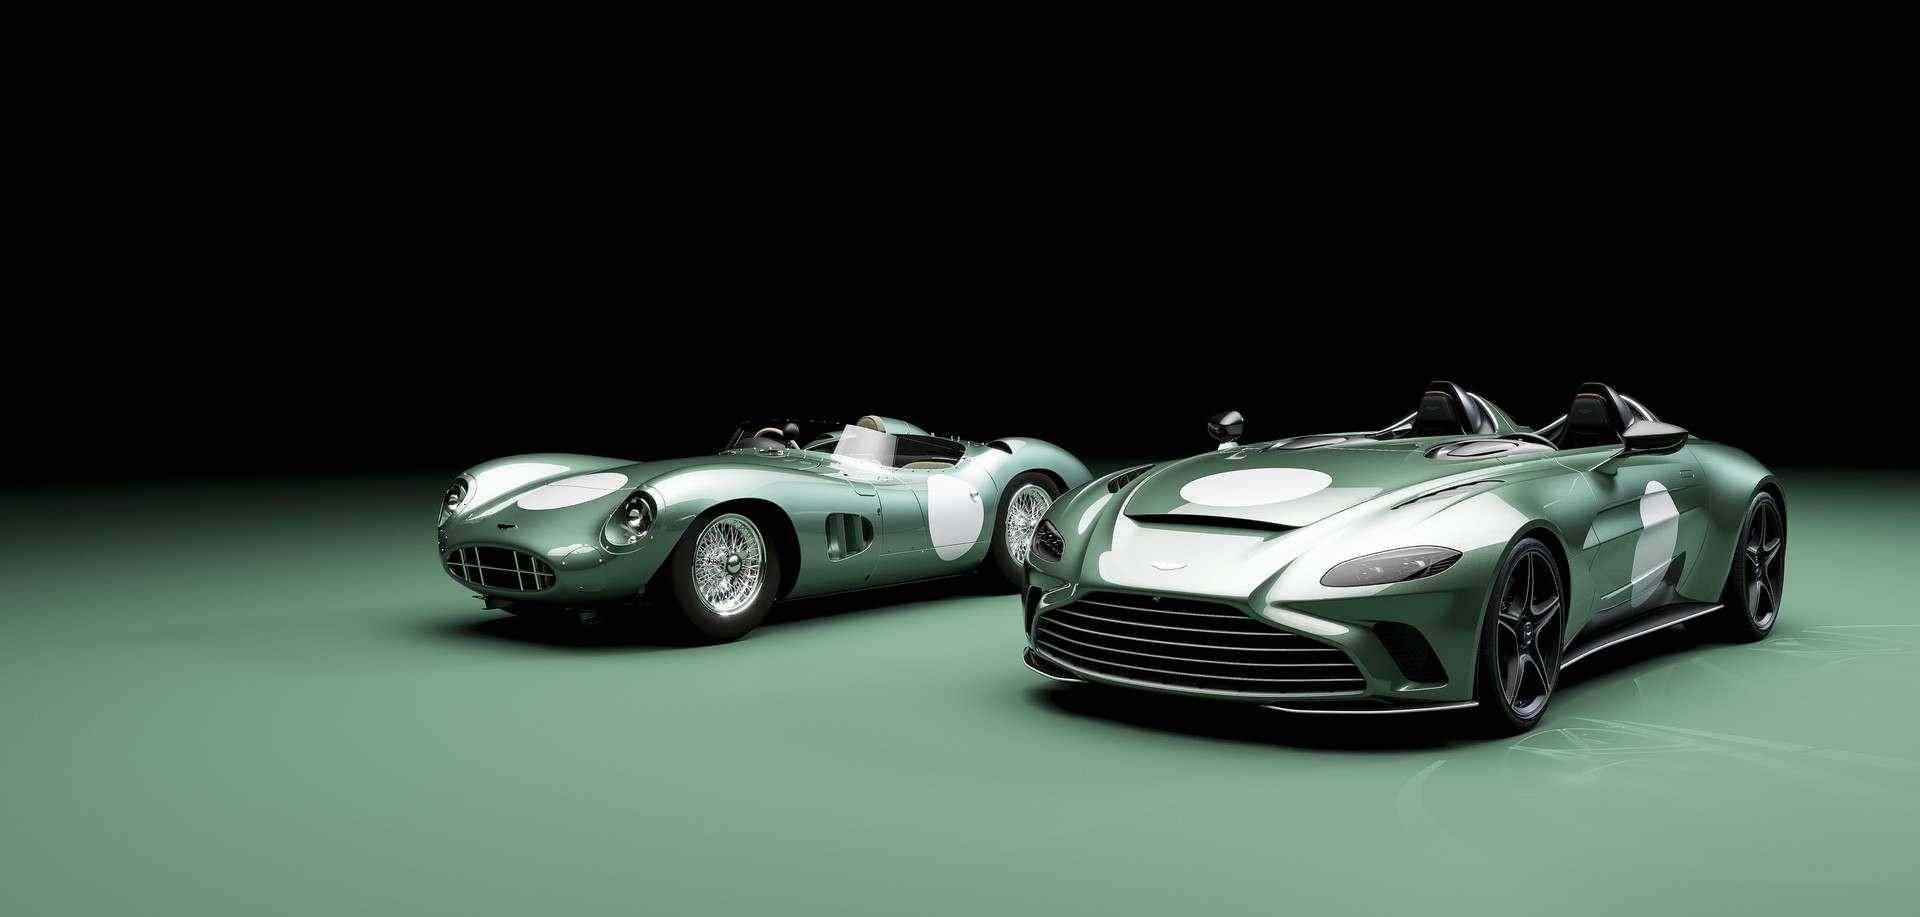 Aston_Martin_V12_Speedster_DBR1_Pack-0000